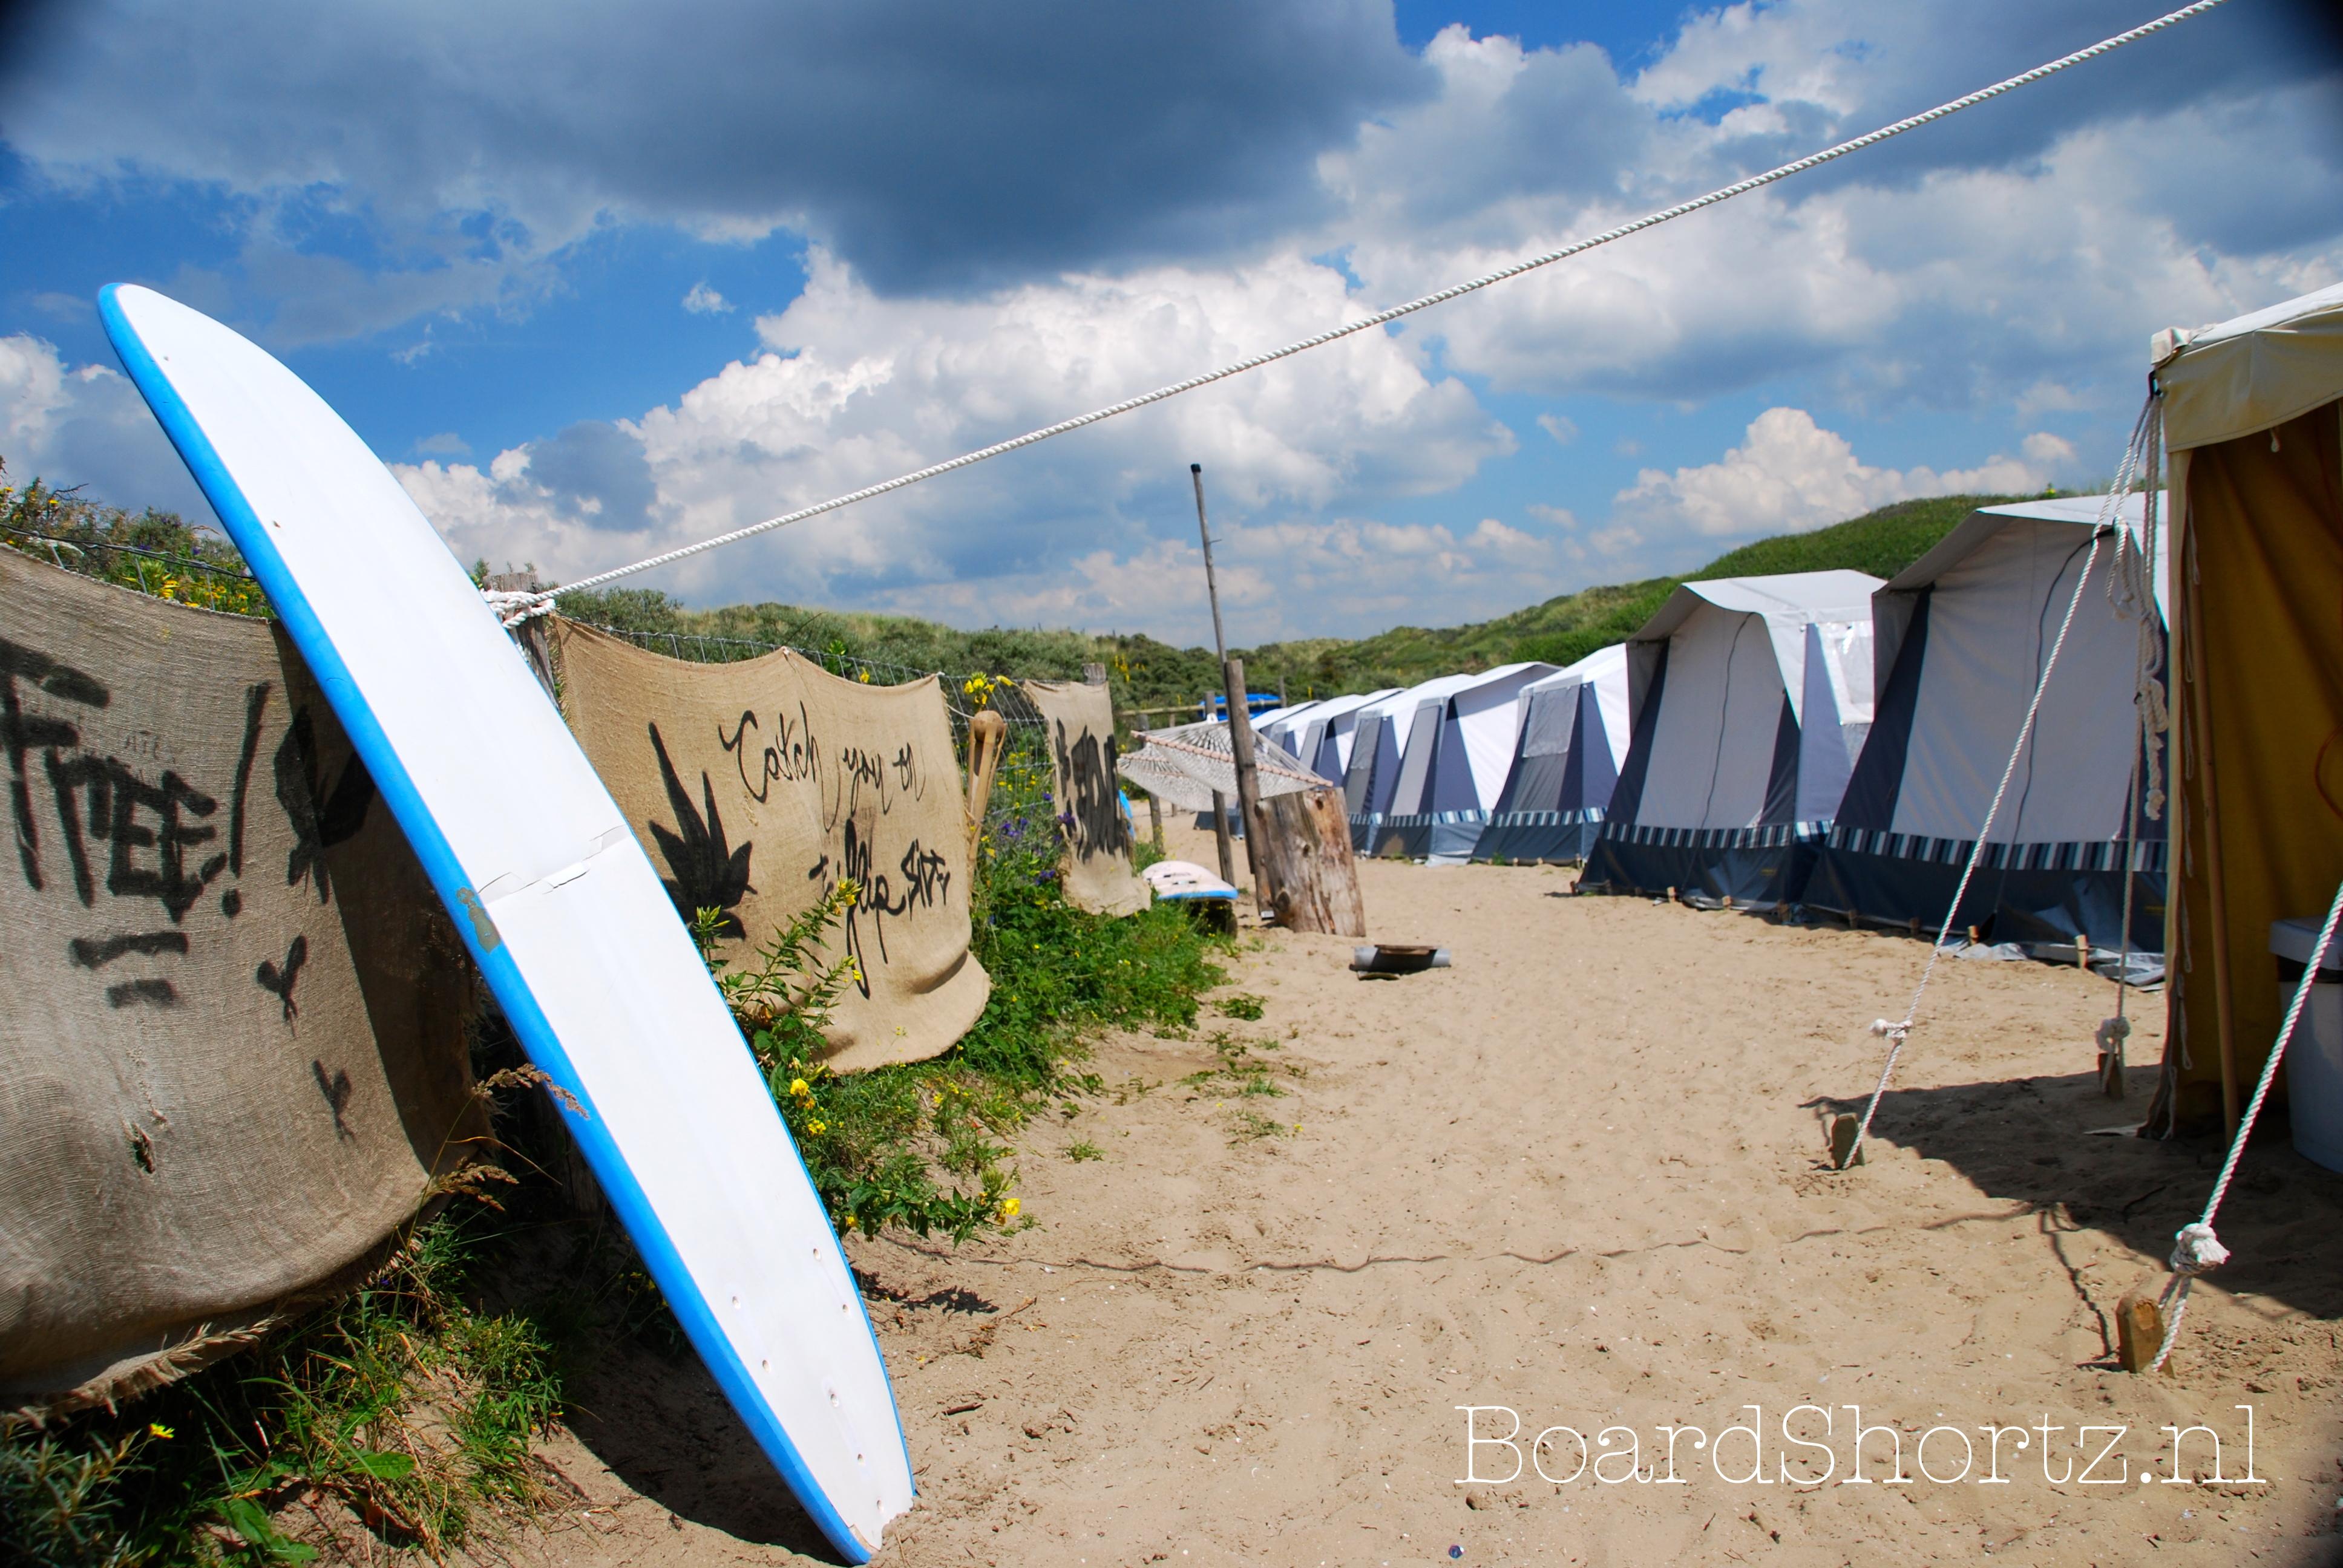 Surfcamp camping De Lakens